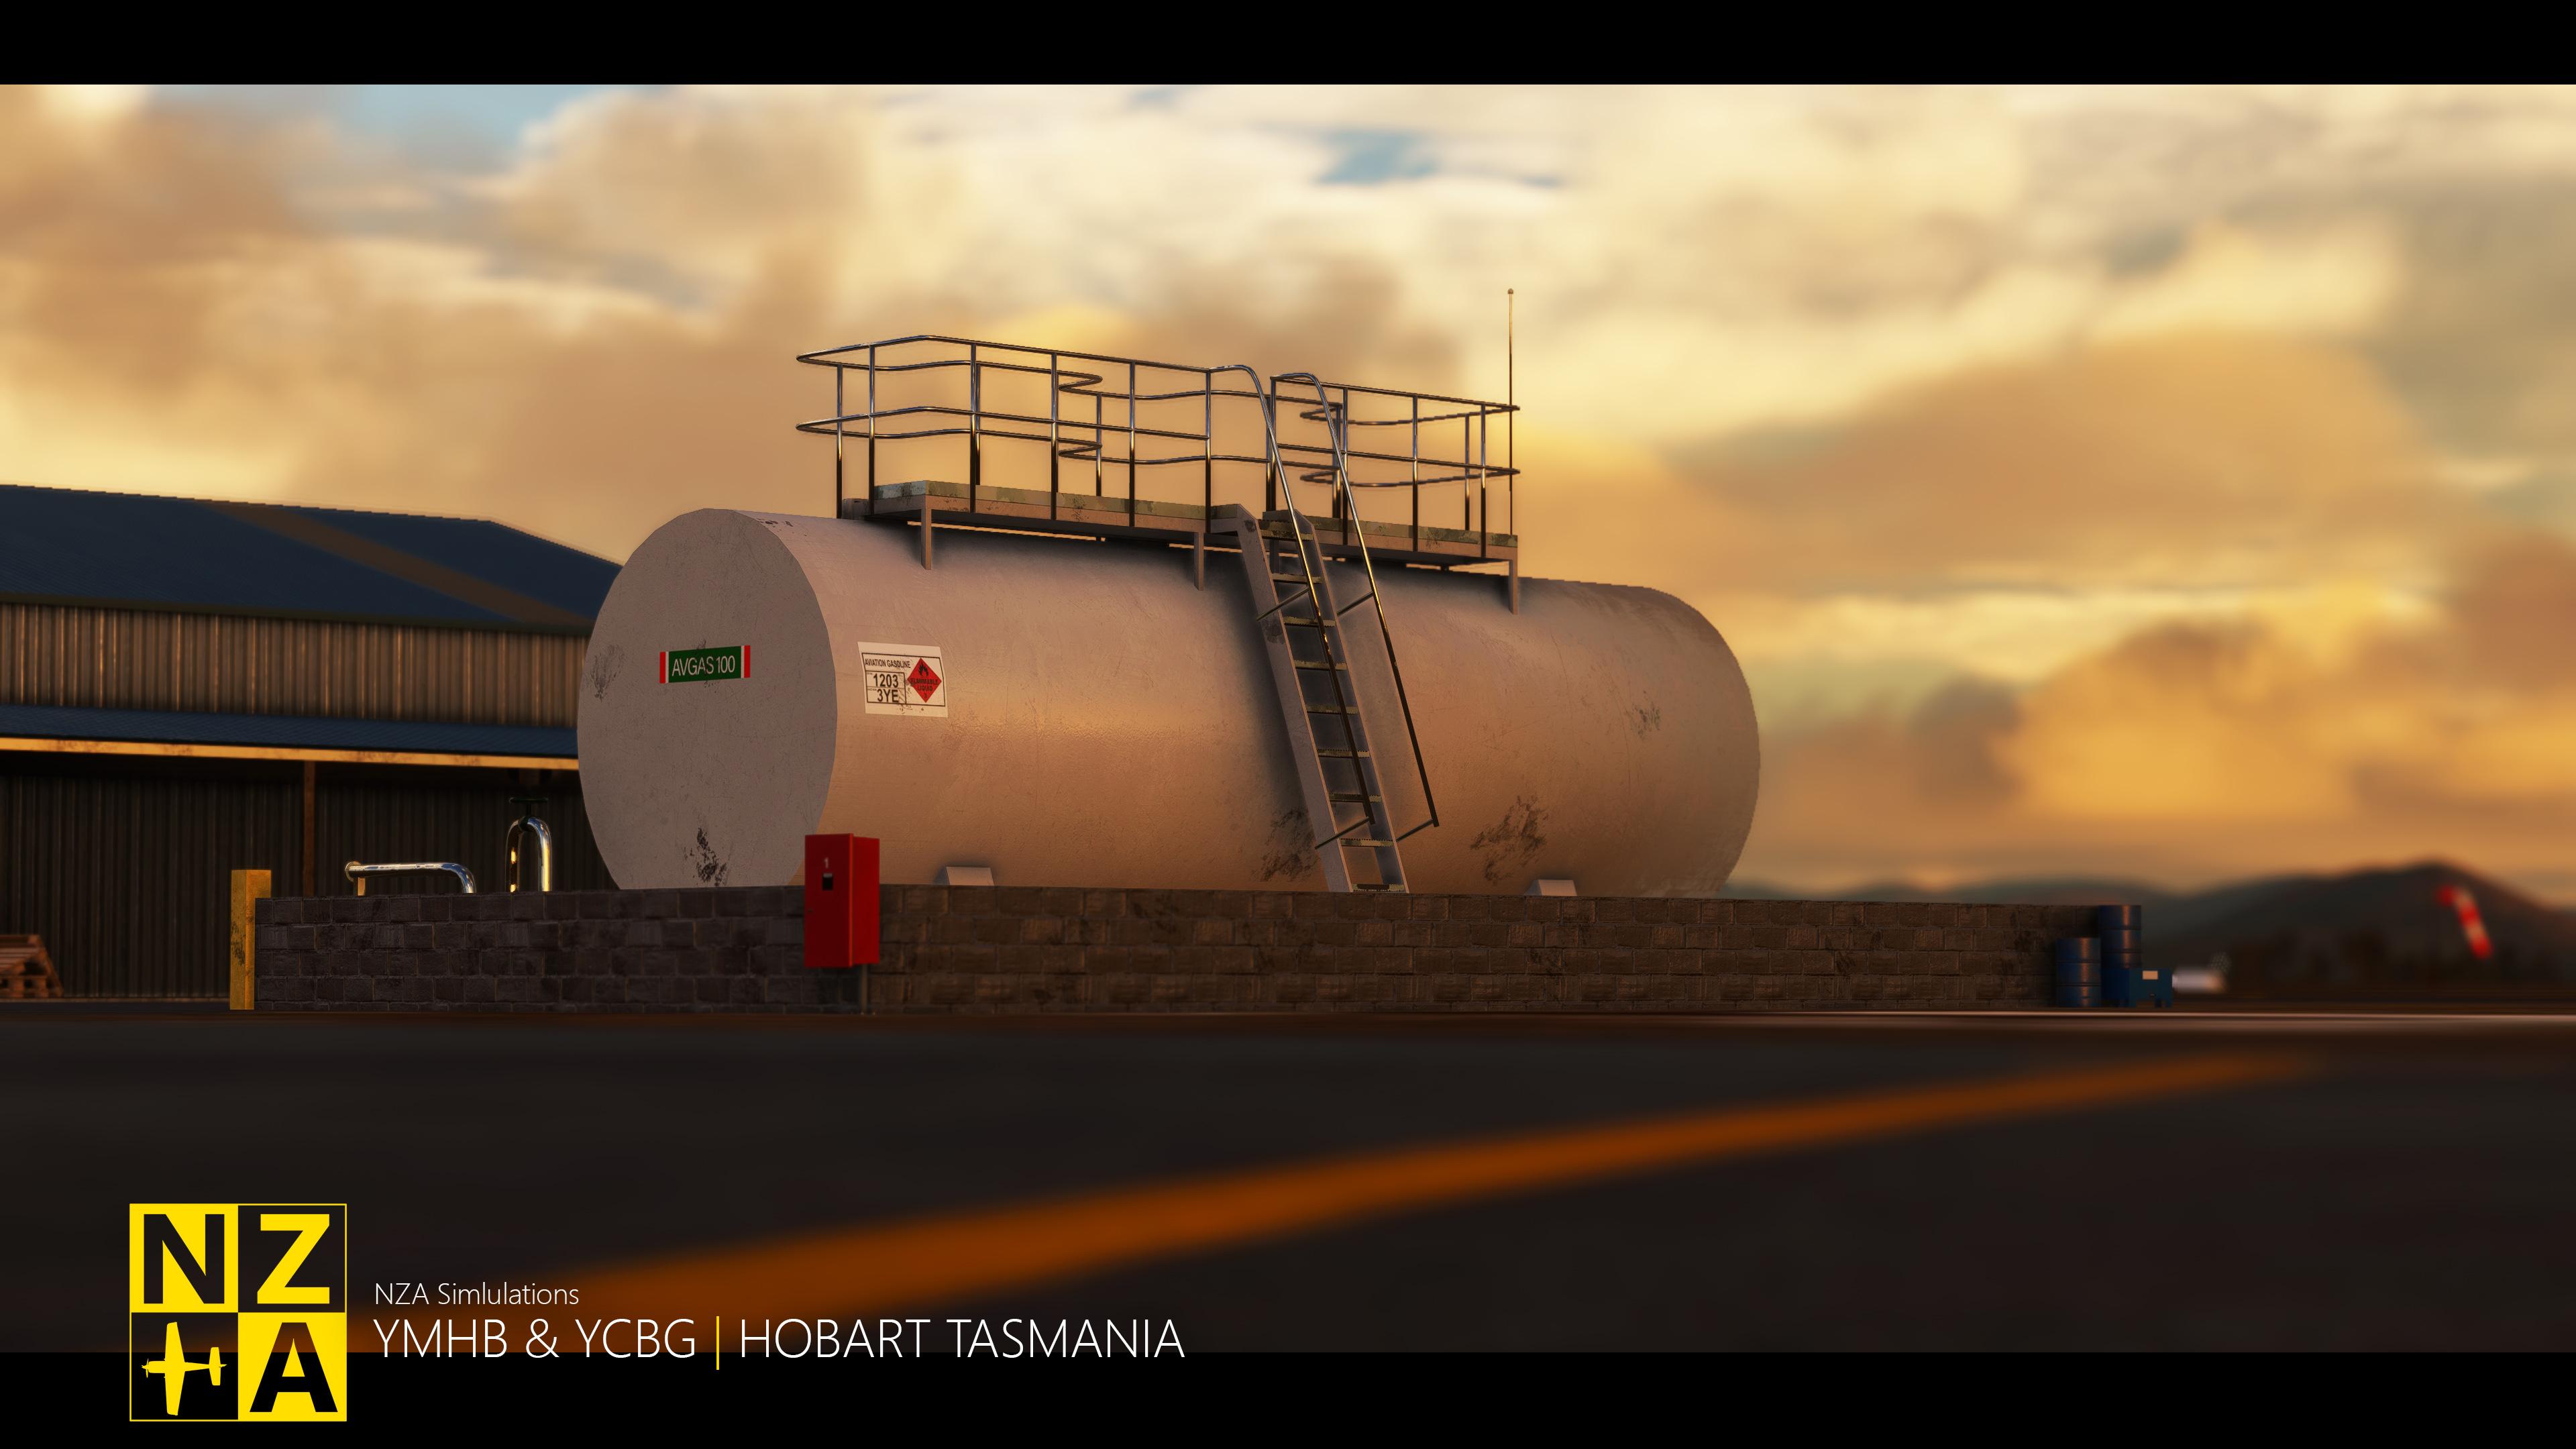 NZA Simulations - YMHB & YCBG - AV100_Tank.jpg